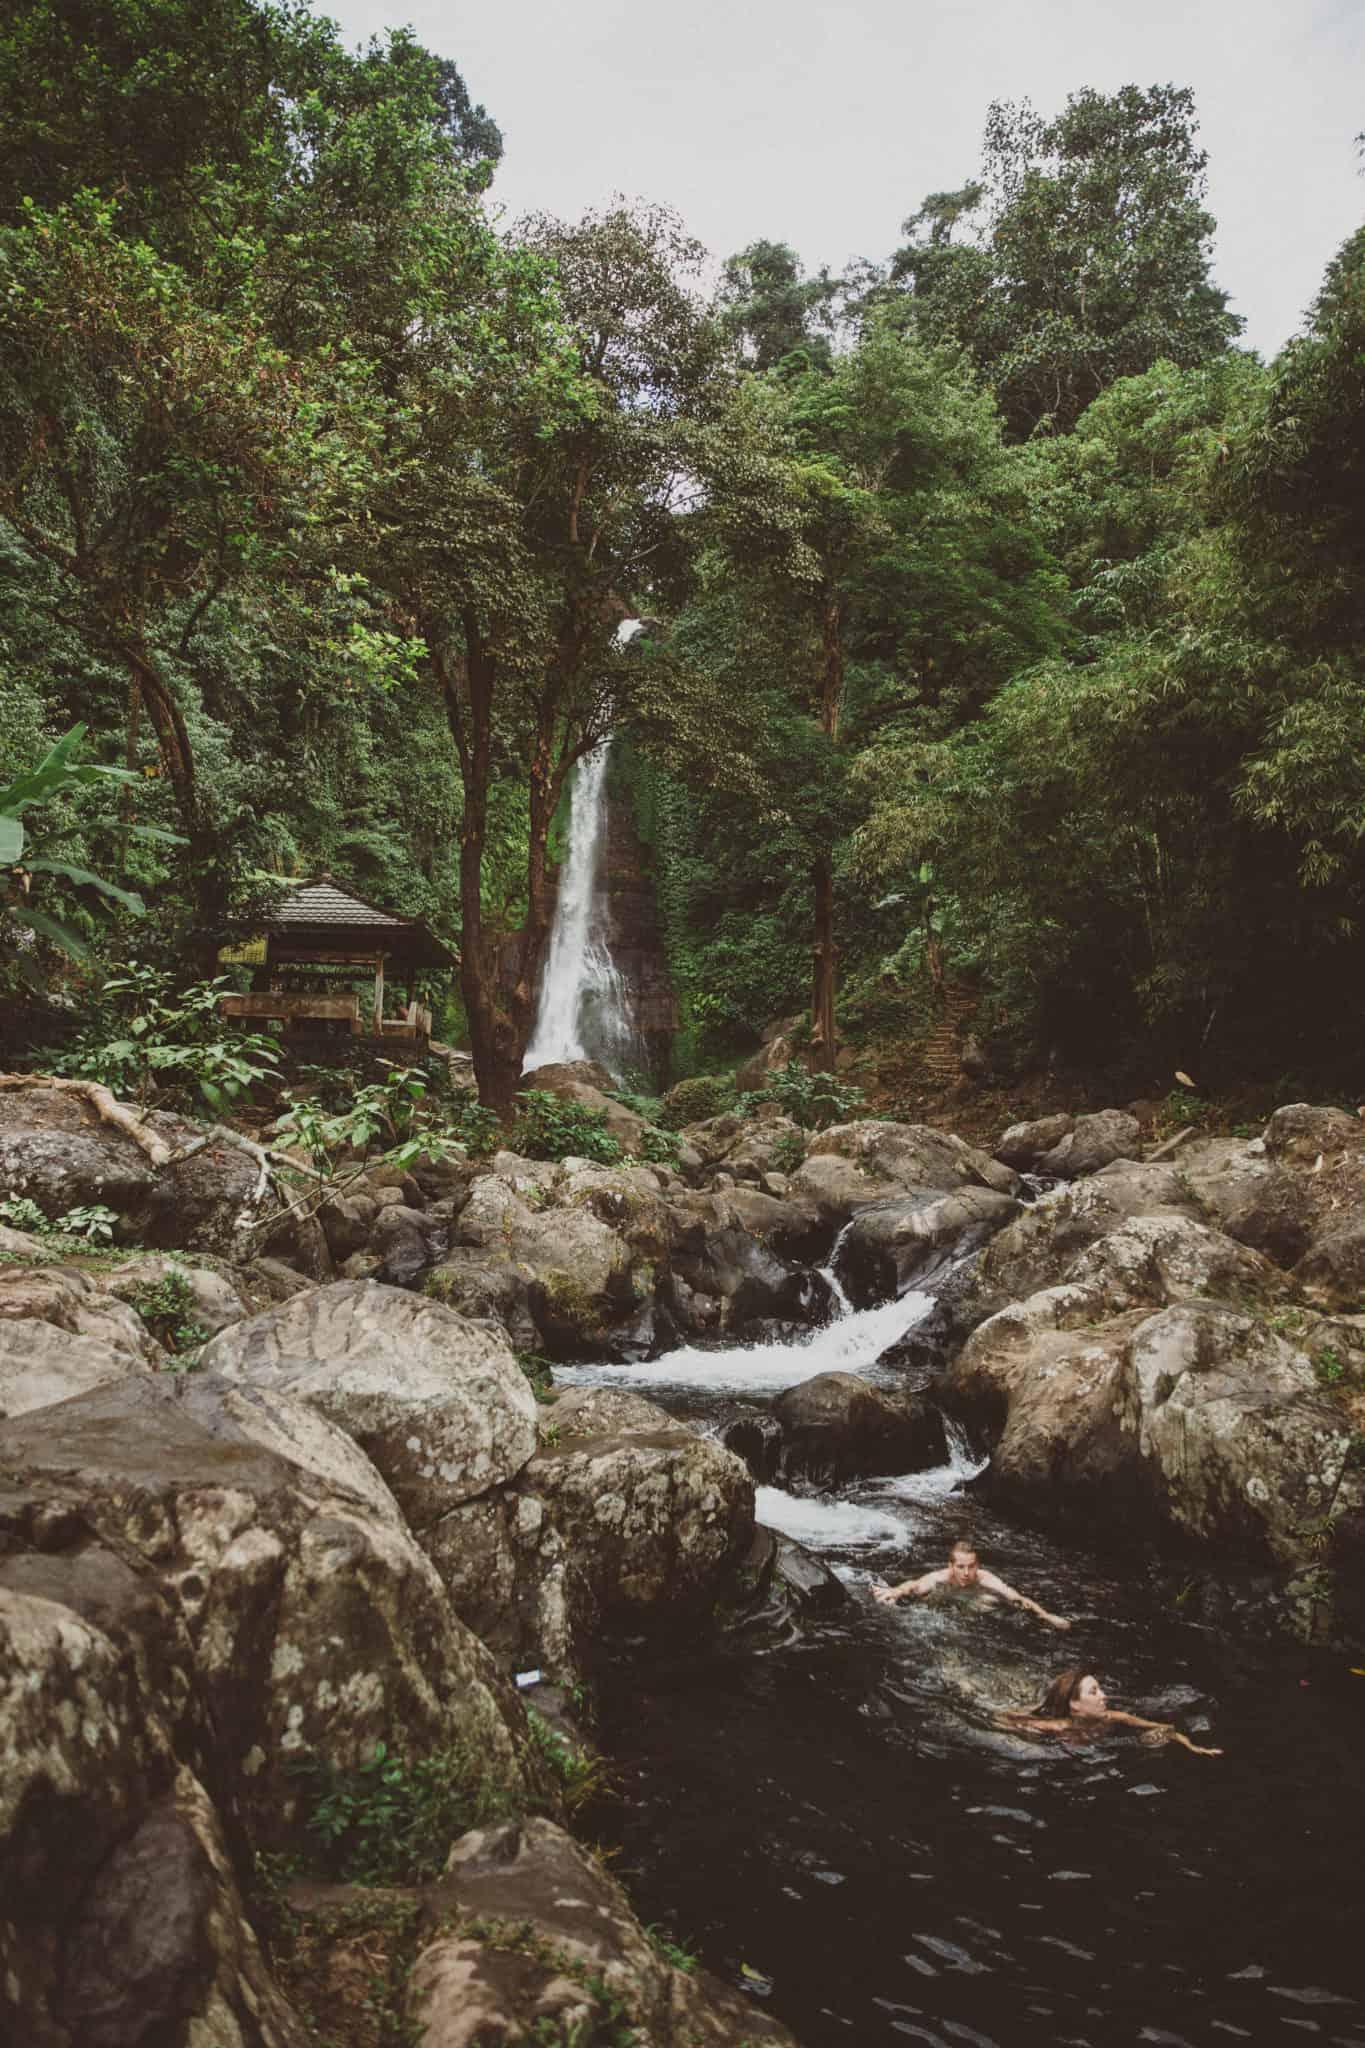 Bali Itinerary 10 Days - Git Git Waterfall - Bali, Indonesia - TheMandagies.com